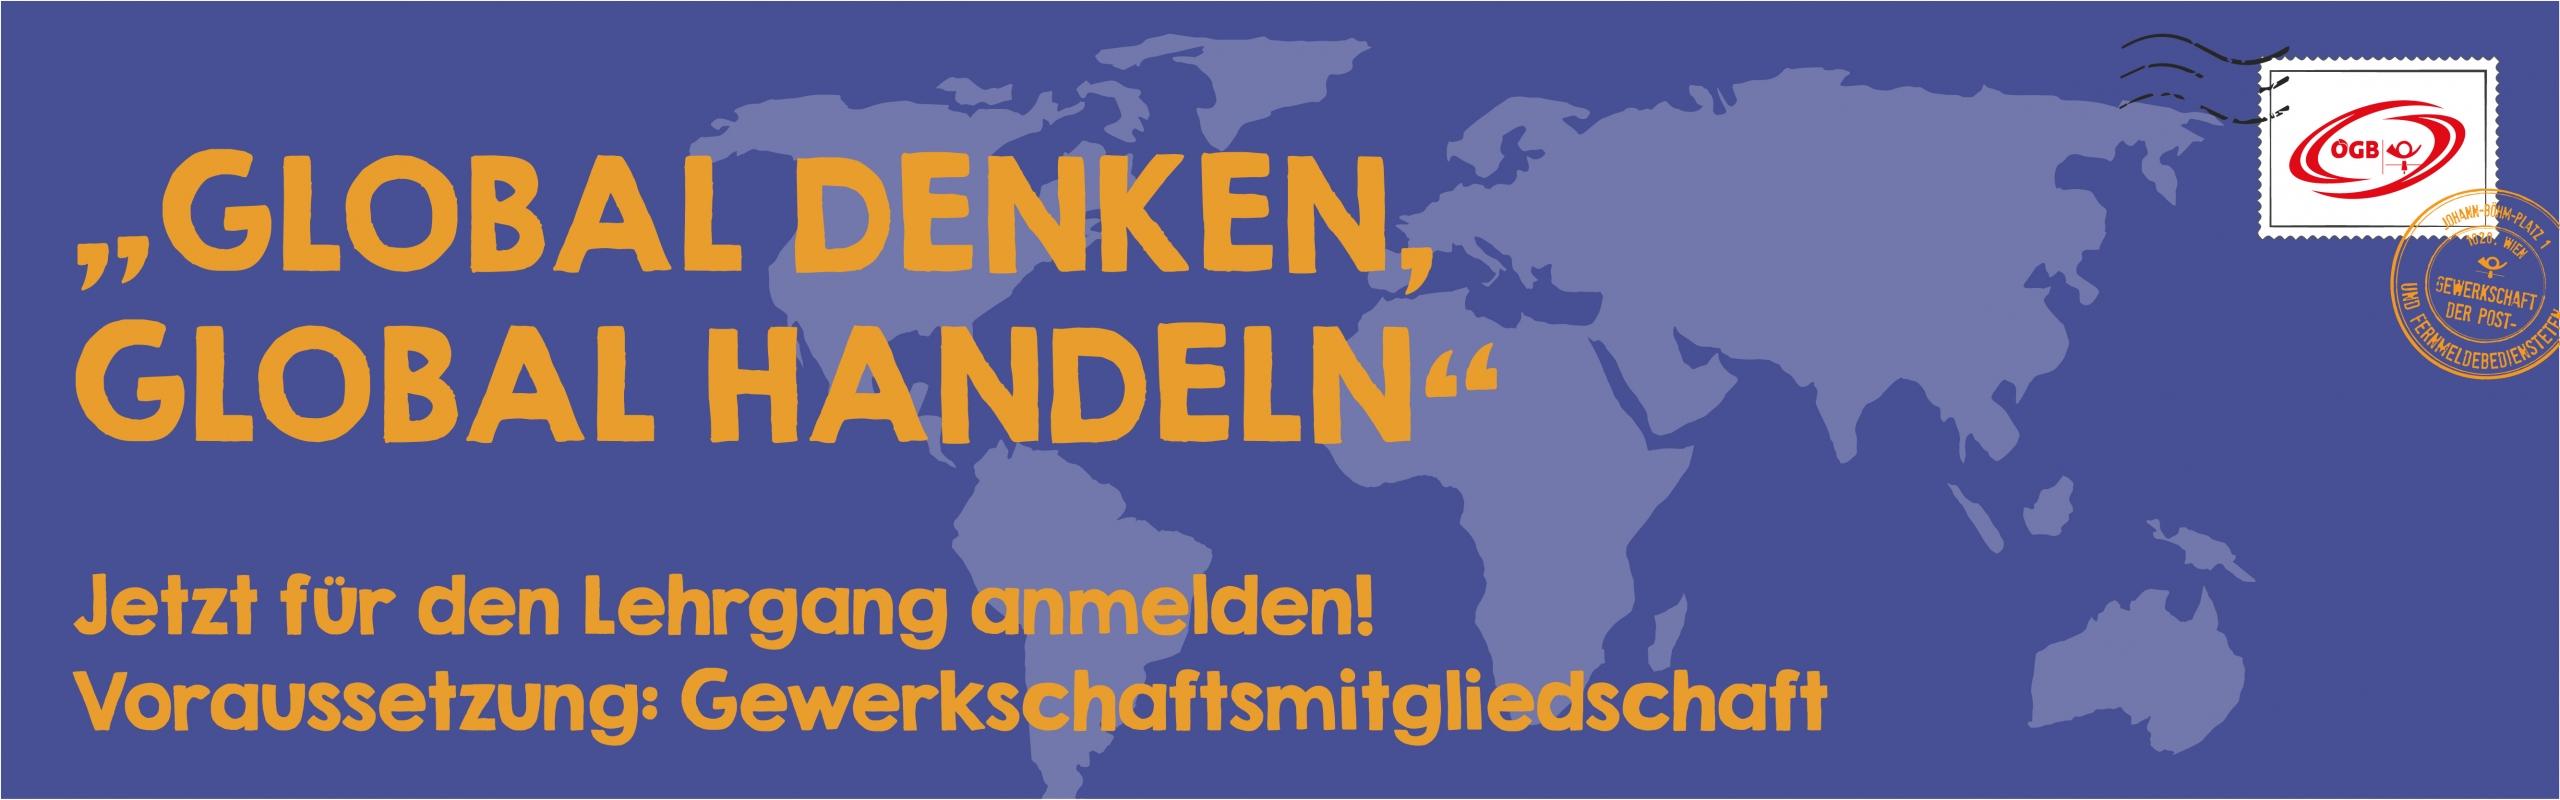 Lehrgang Global denken_global handeln_Banner